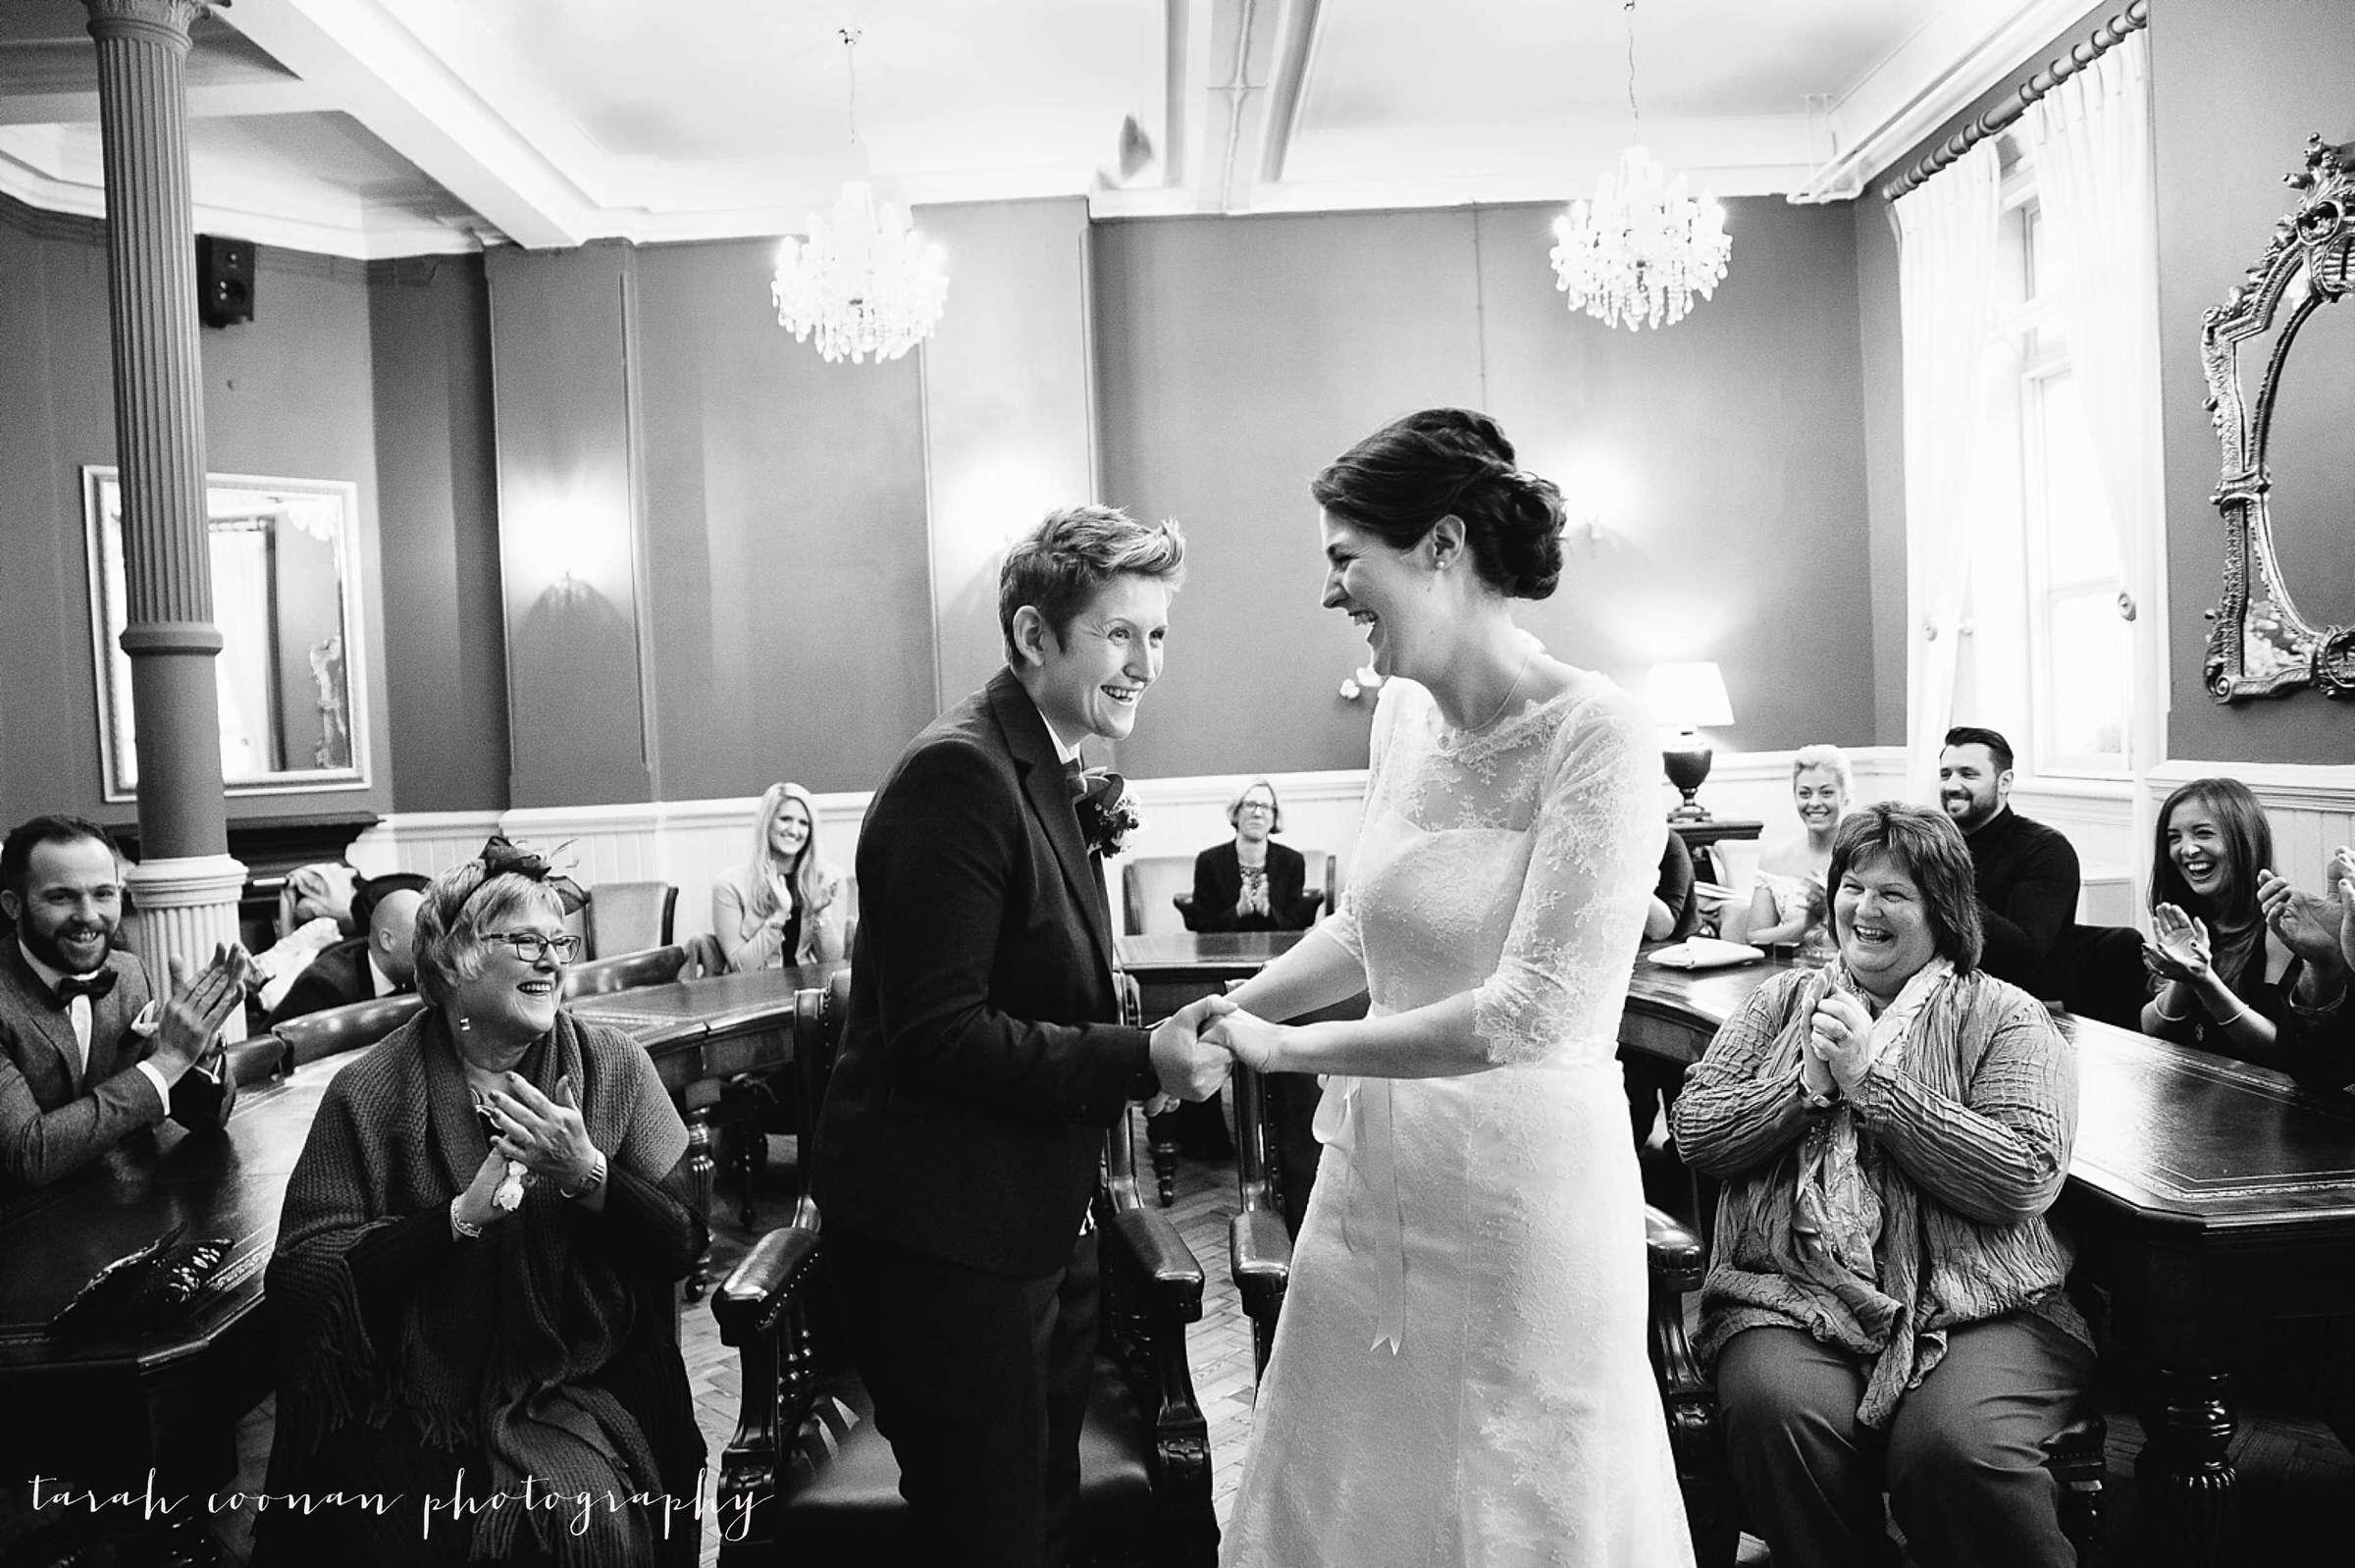 brighton-wedding-photographer_015-4